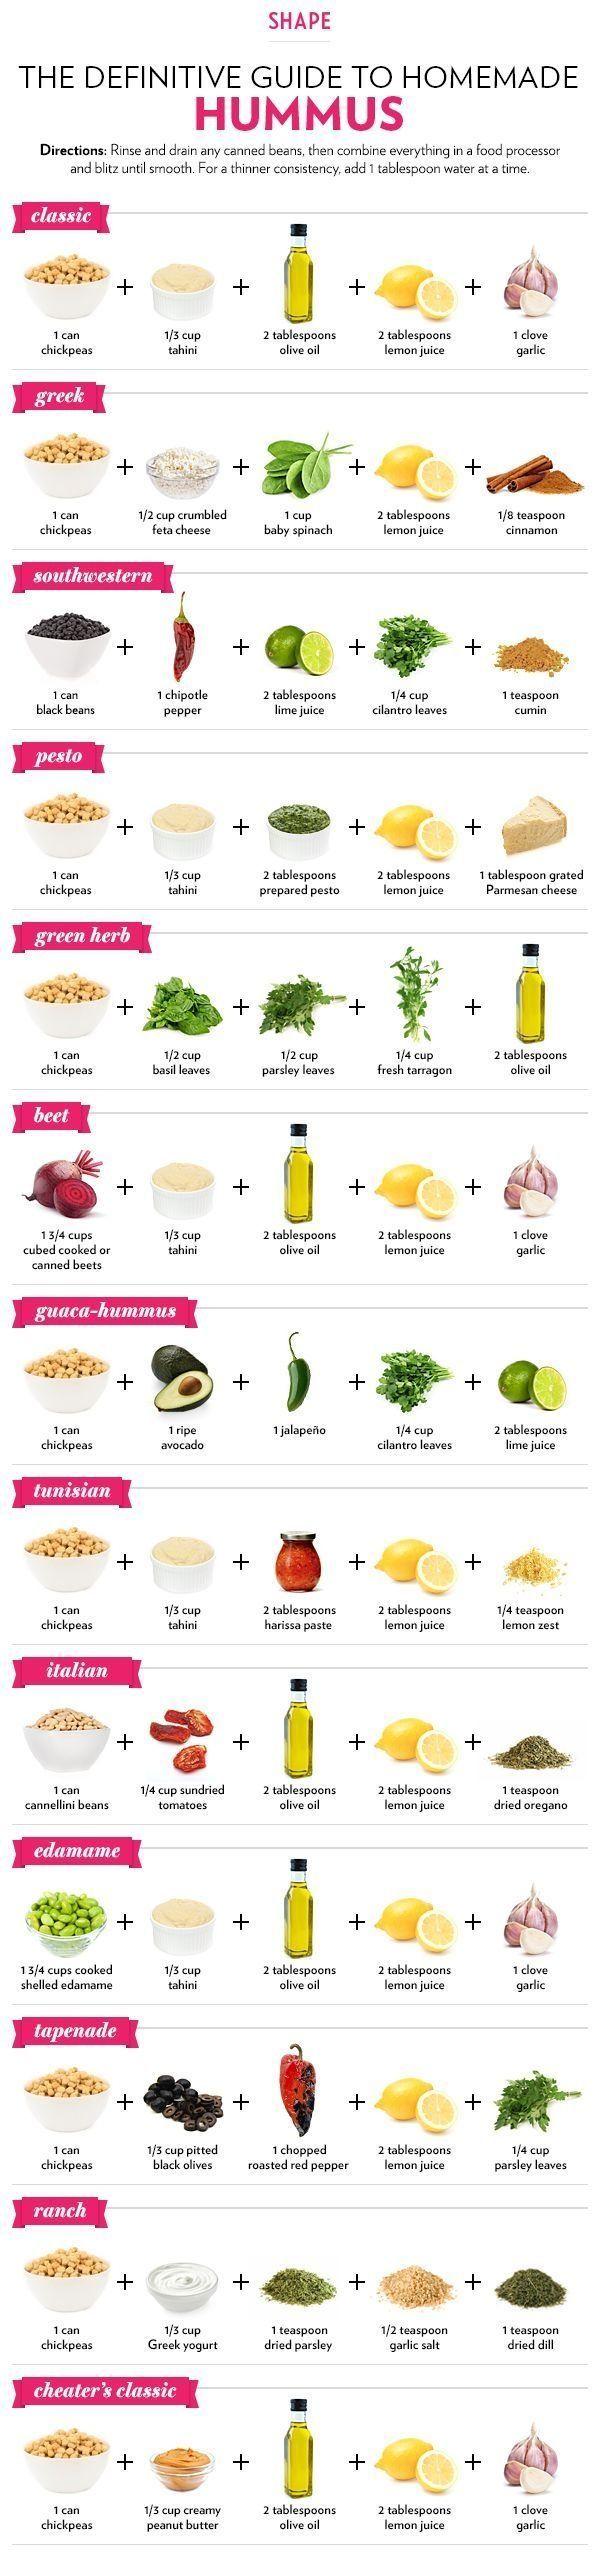 13 Different Ways to Make Hummus